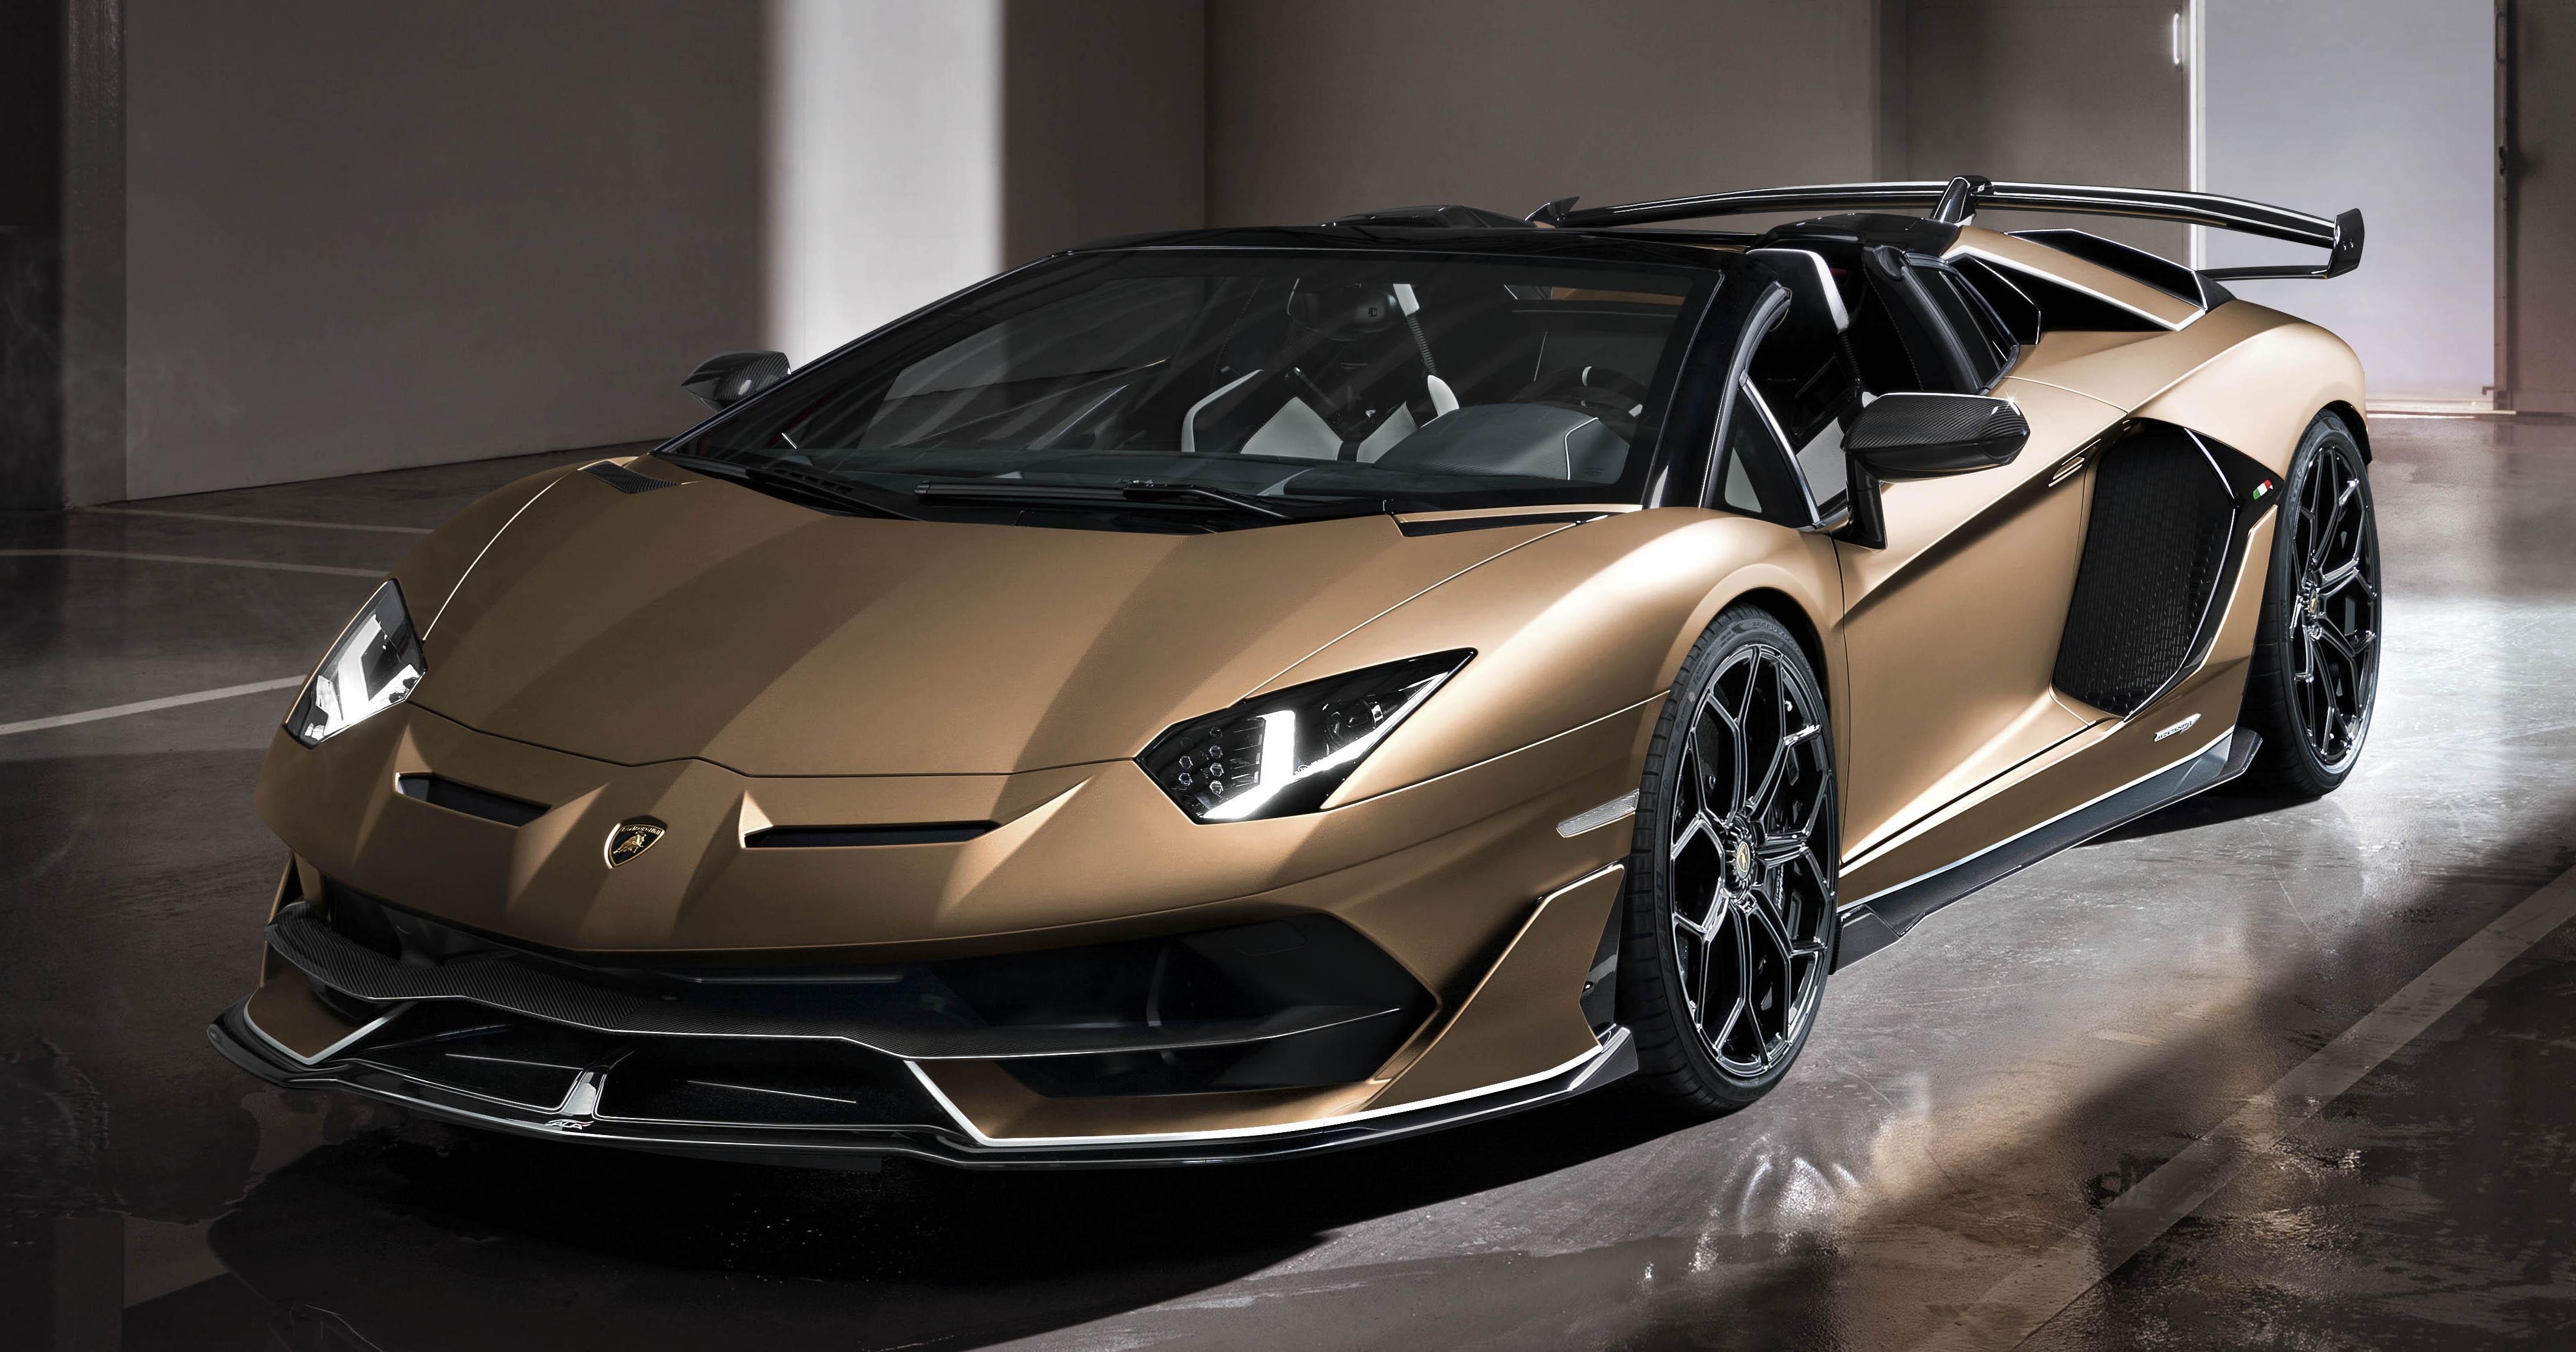 Lamborghini Aventador Svj Roadster Only 800 Units Paultan Org